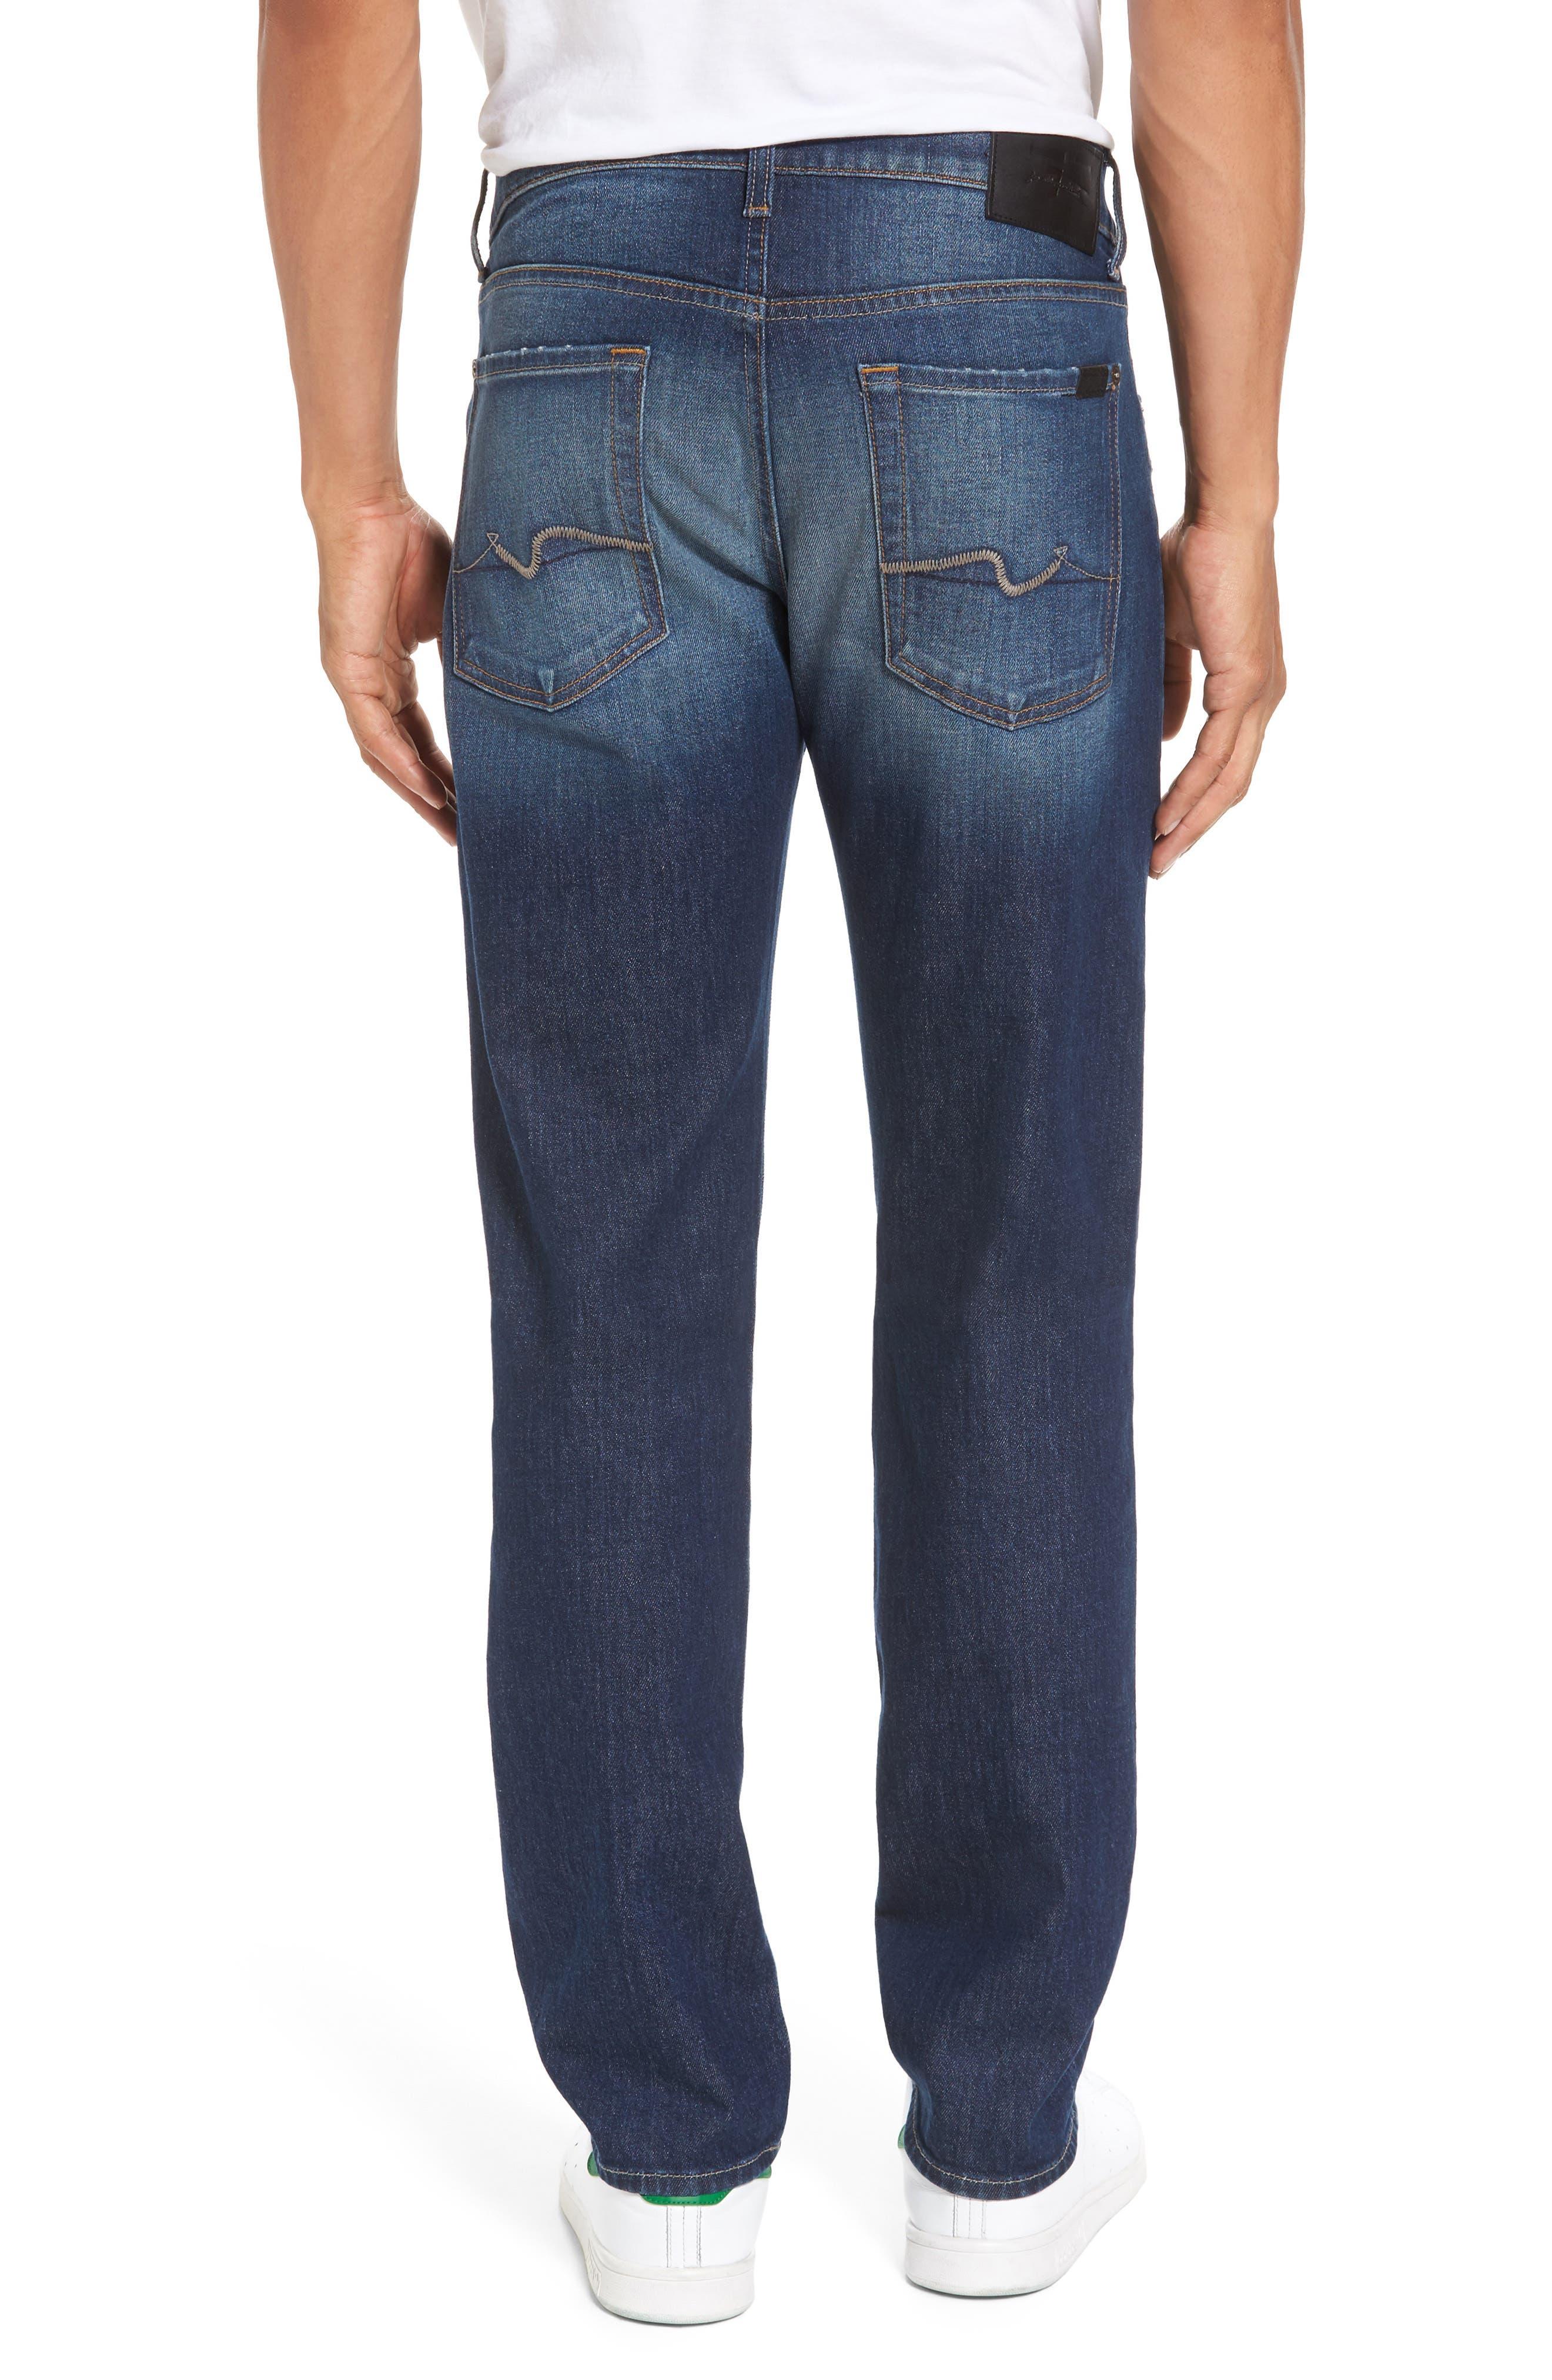 Alternate Image 2  - 7 For All Mankind® Slimmy Slim Fit Jeans (Venture)